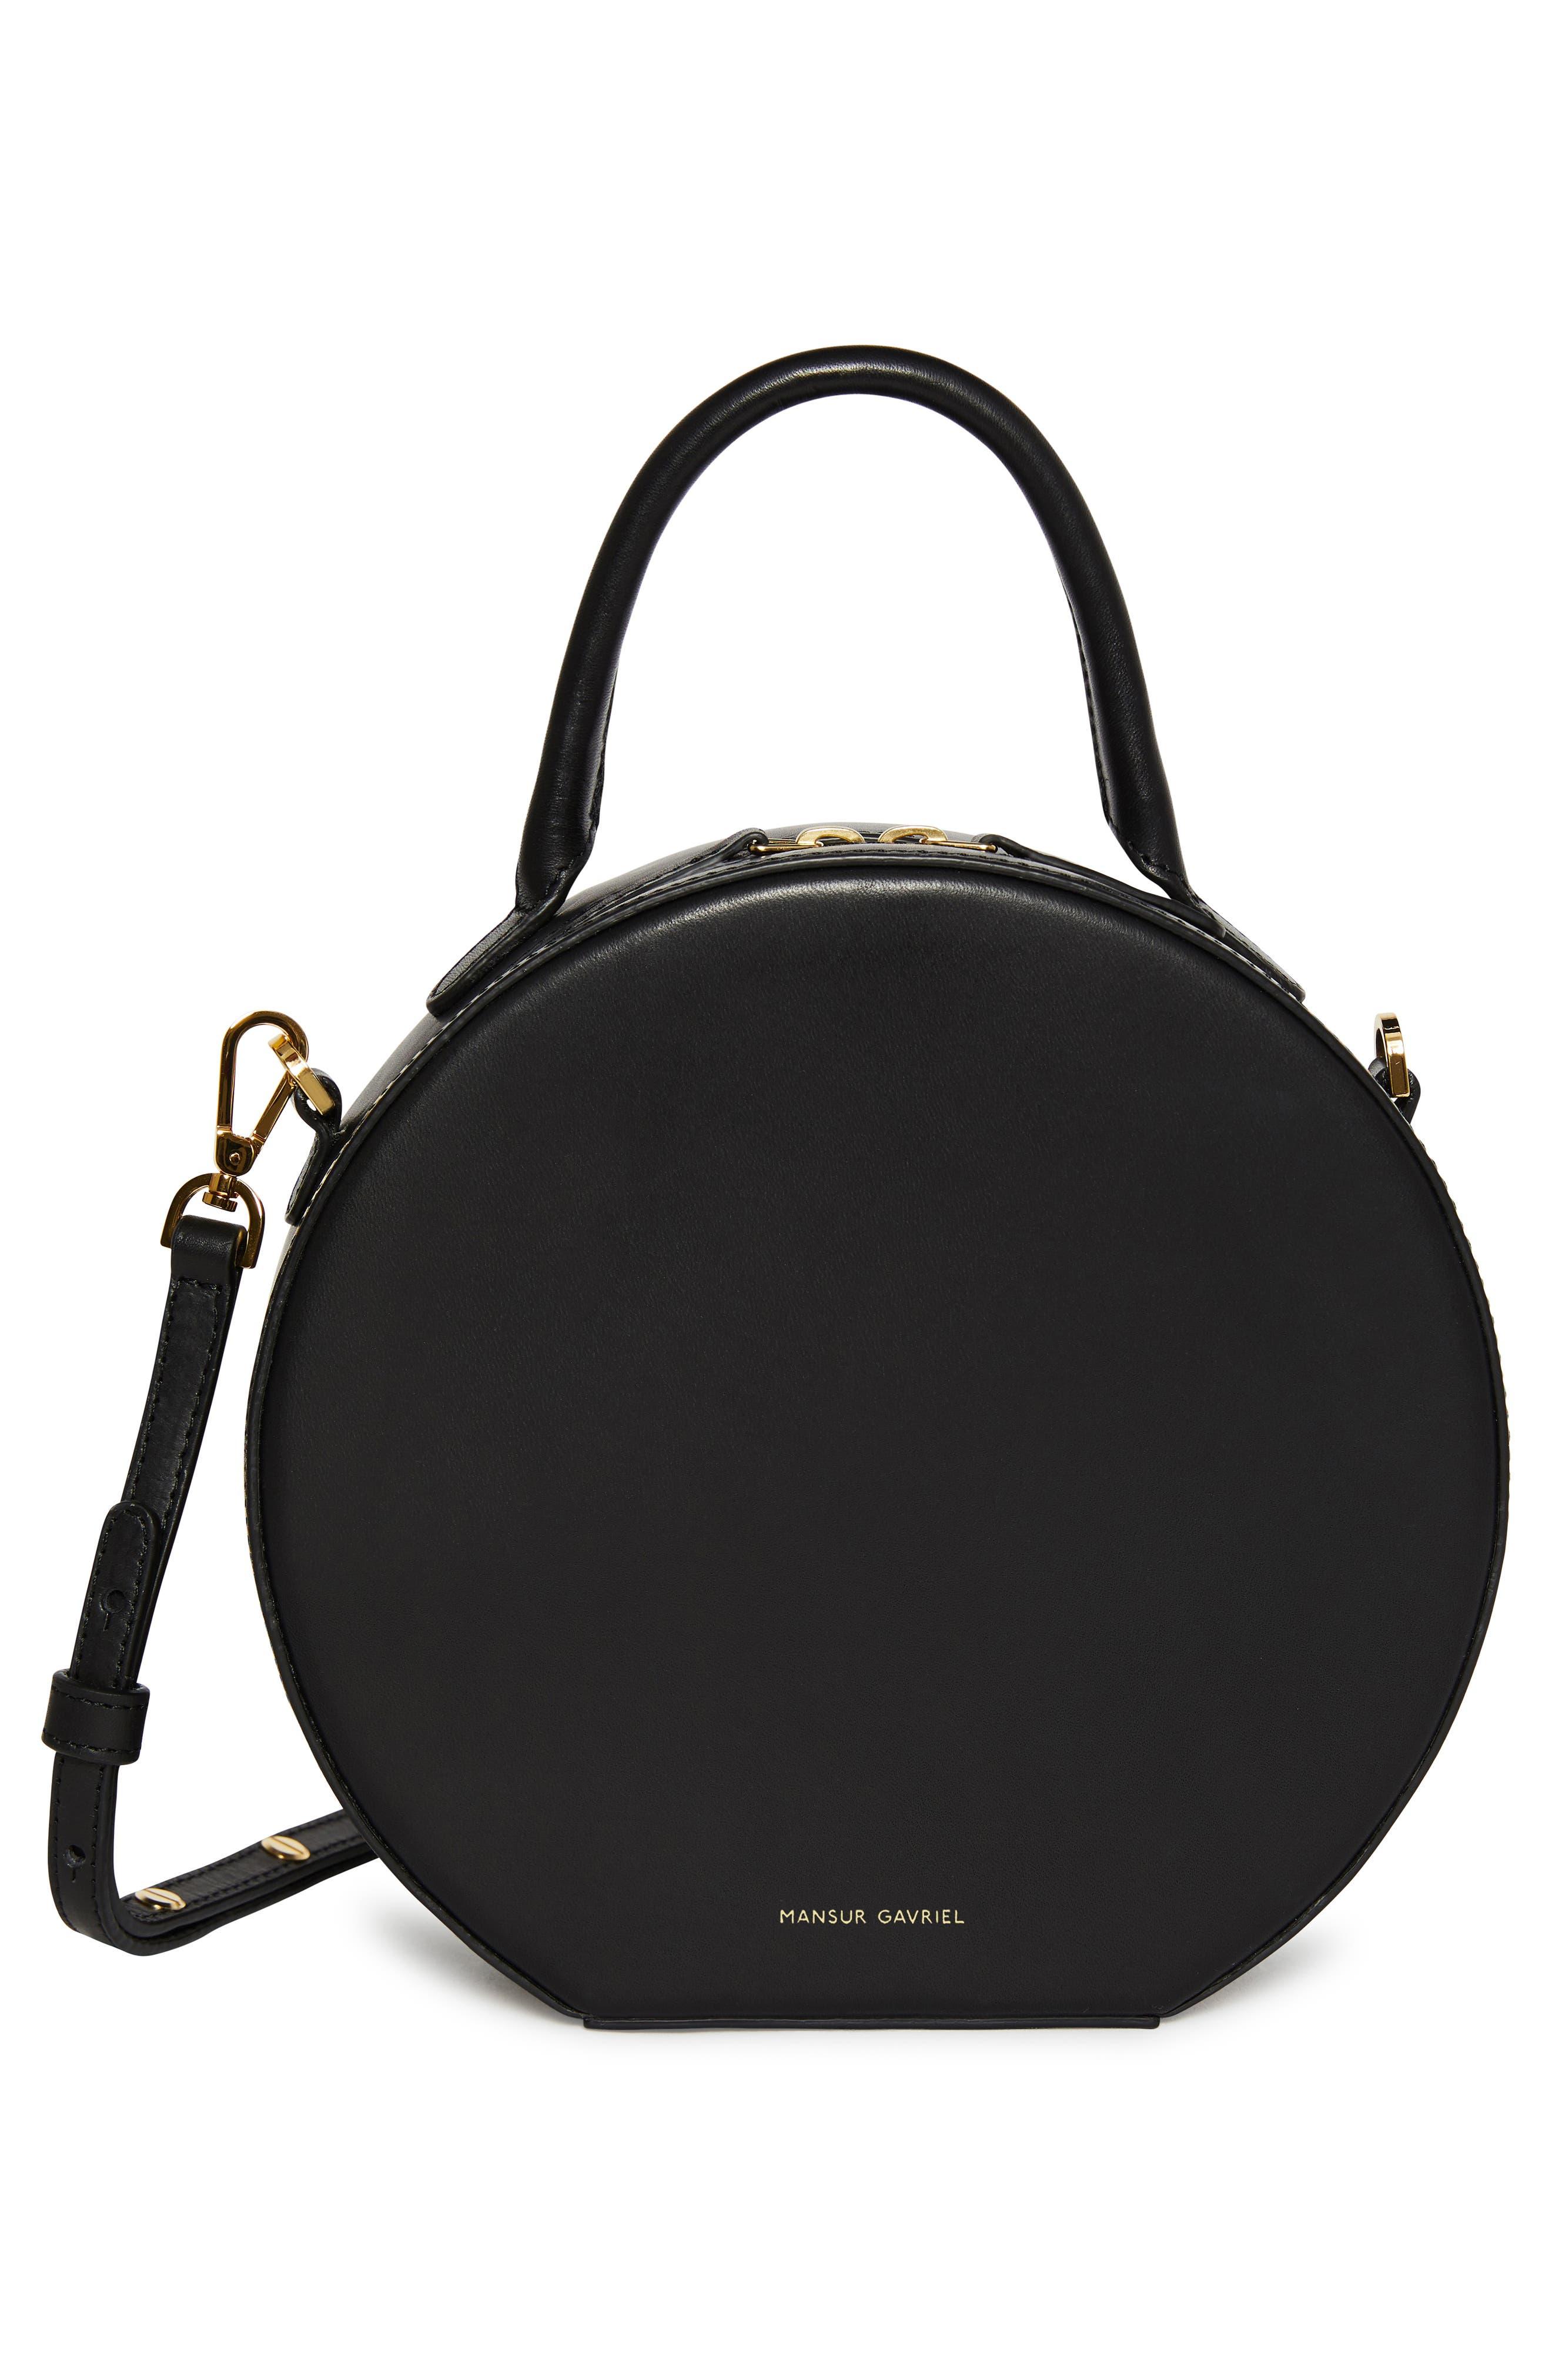 MANSUR GAVRIEL, Leather Circle Crossbody Bag, Alternate thumbnail 3, color, BLACK